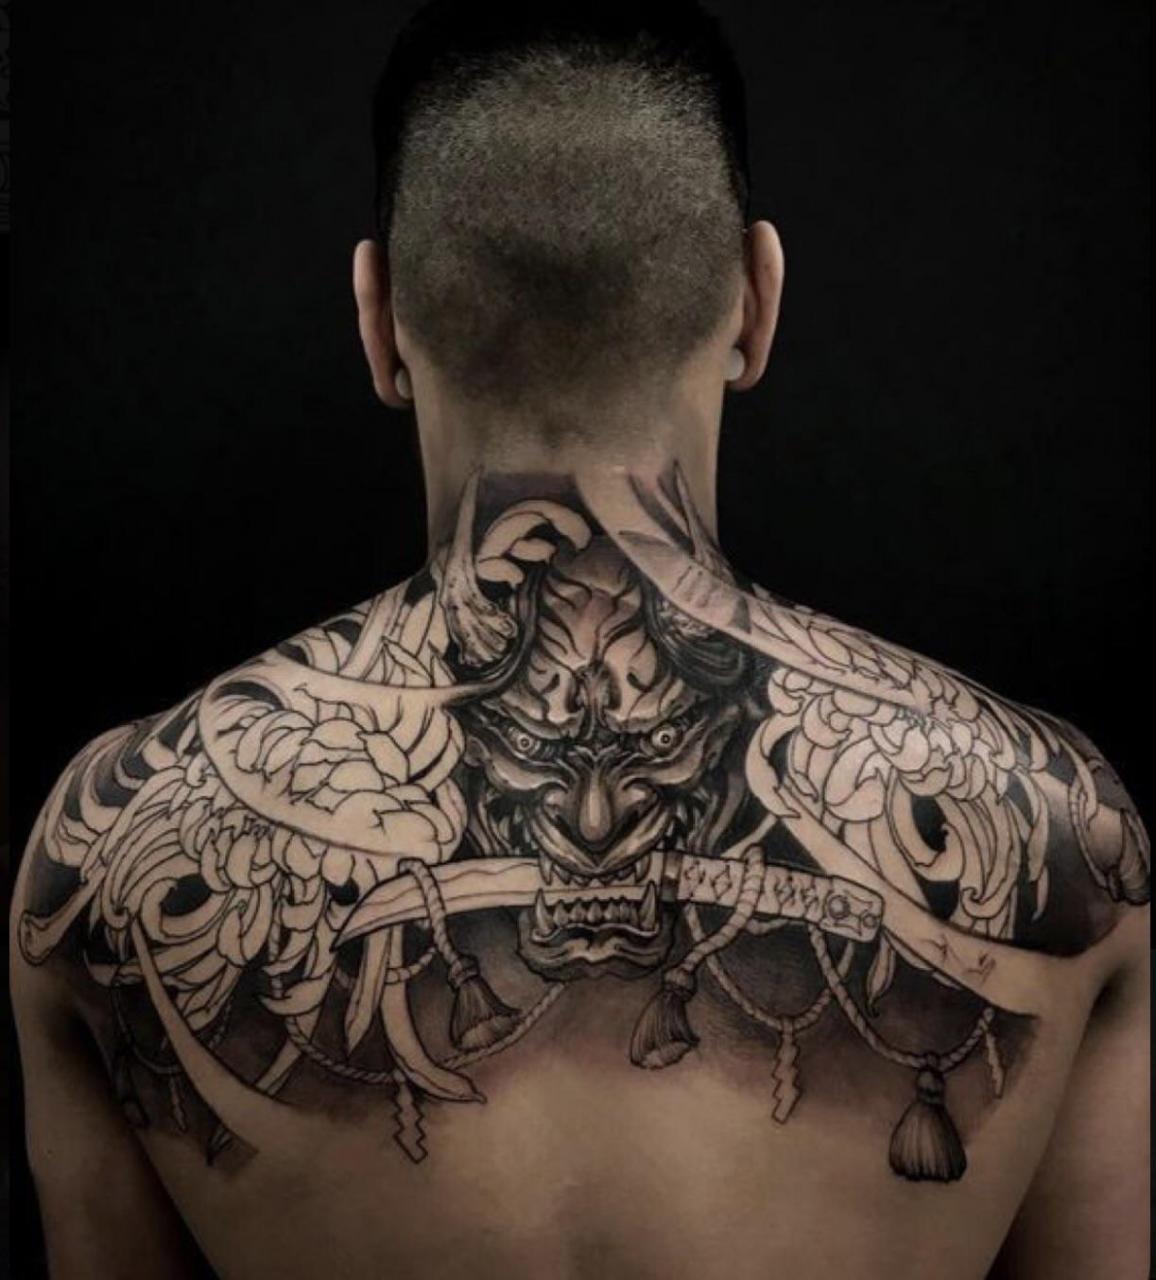 Japanese inspired upper back tattoo. Tattoo done by lumina tattoo studio